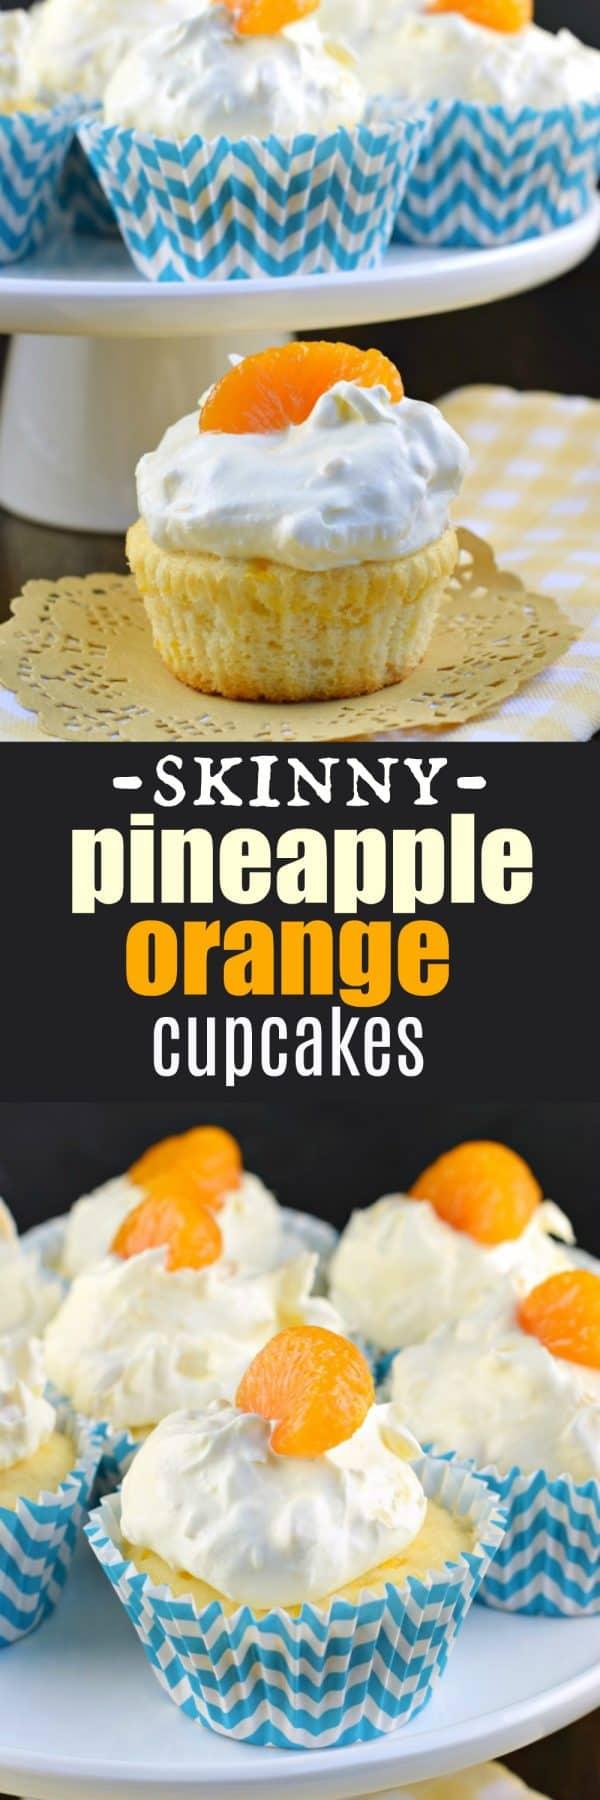 Skinny Orange Pineapple Cupcakes. Less than 75 calories per cupcake, aka pig pickin cupcakes!